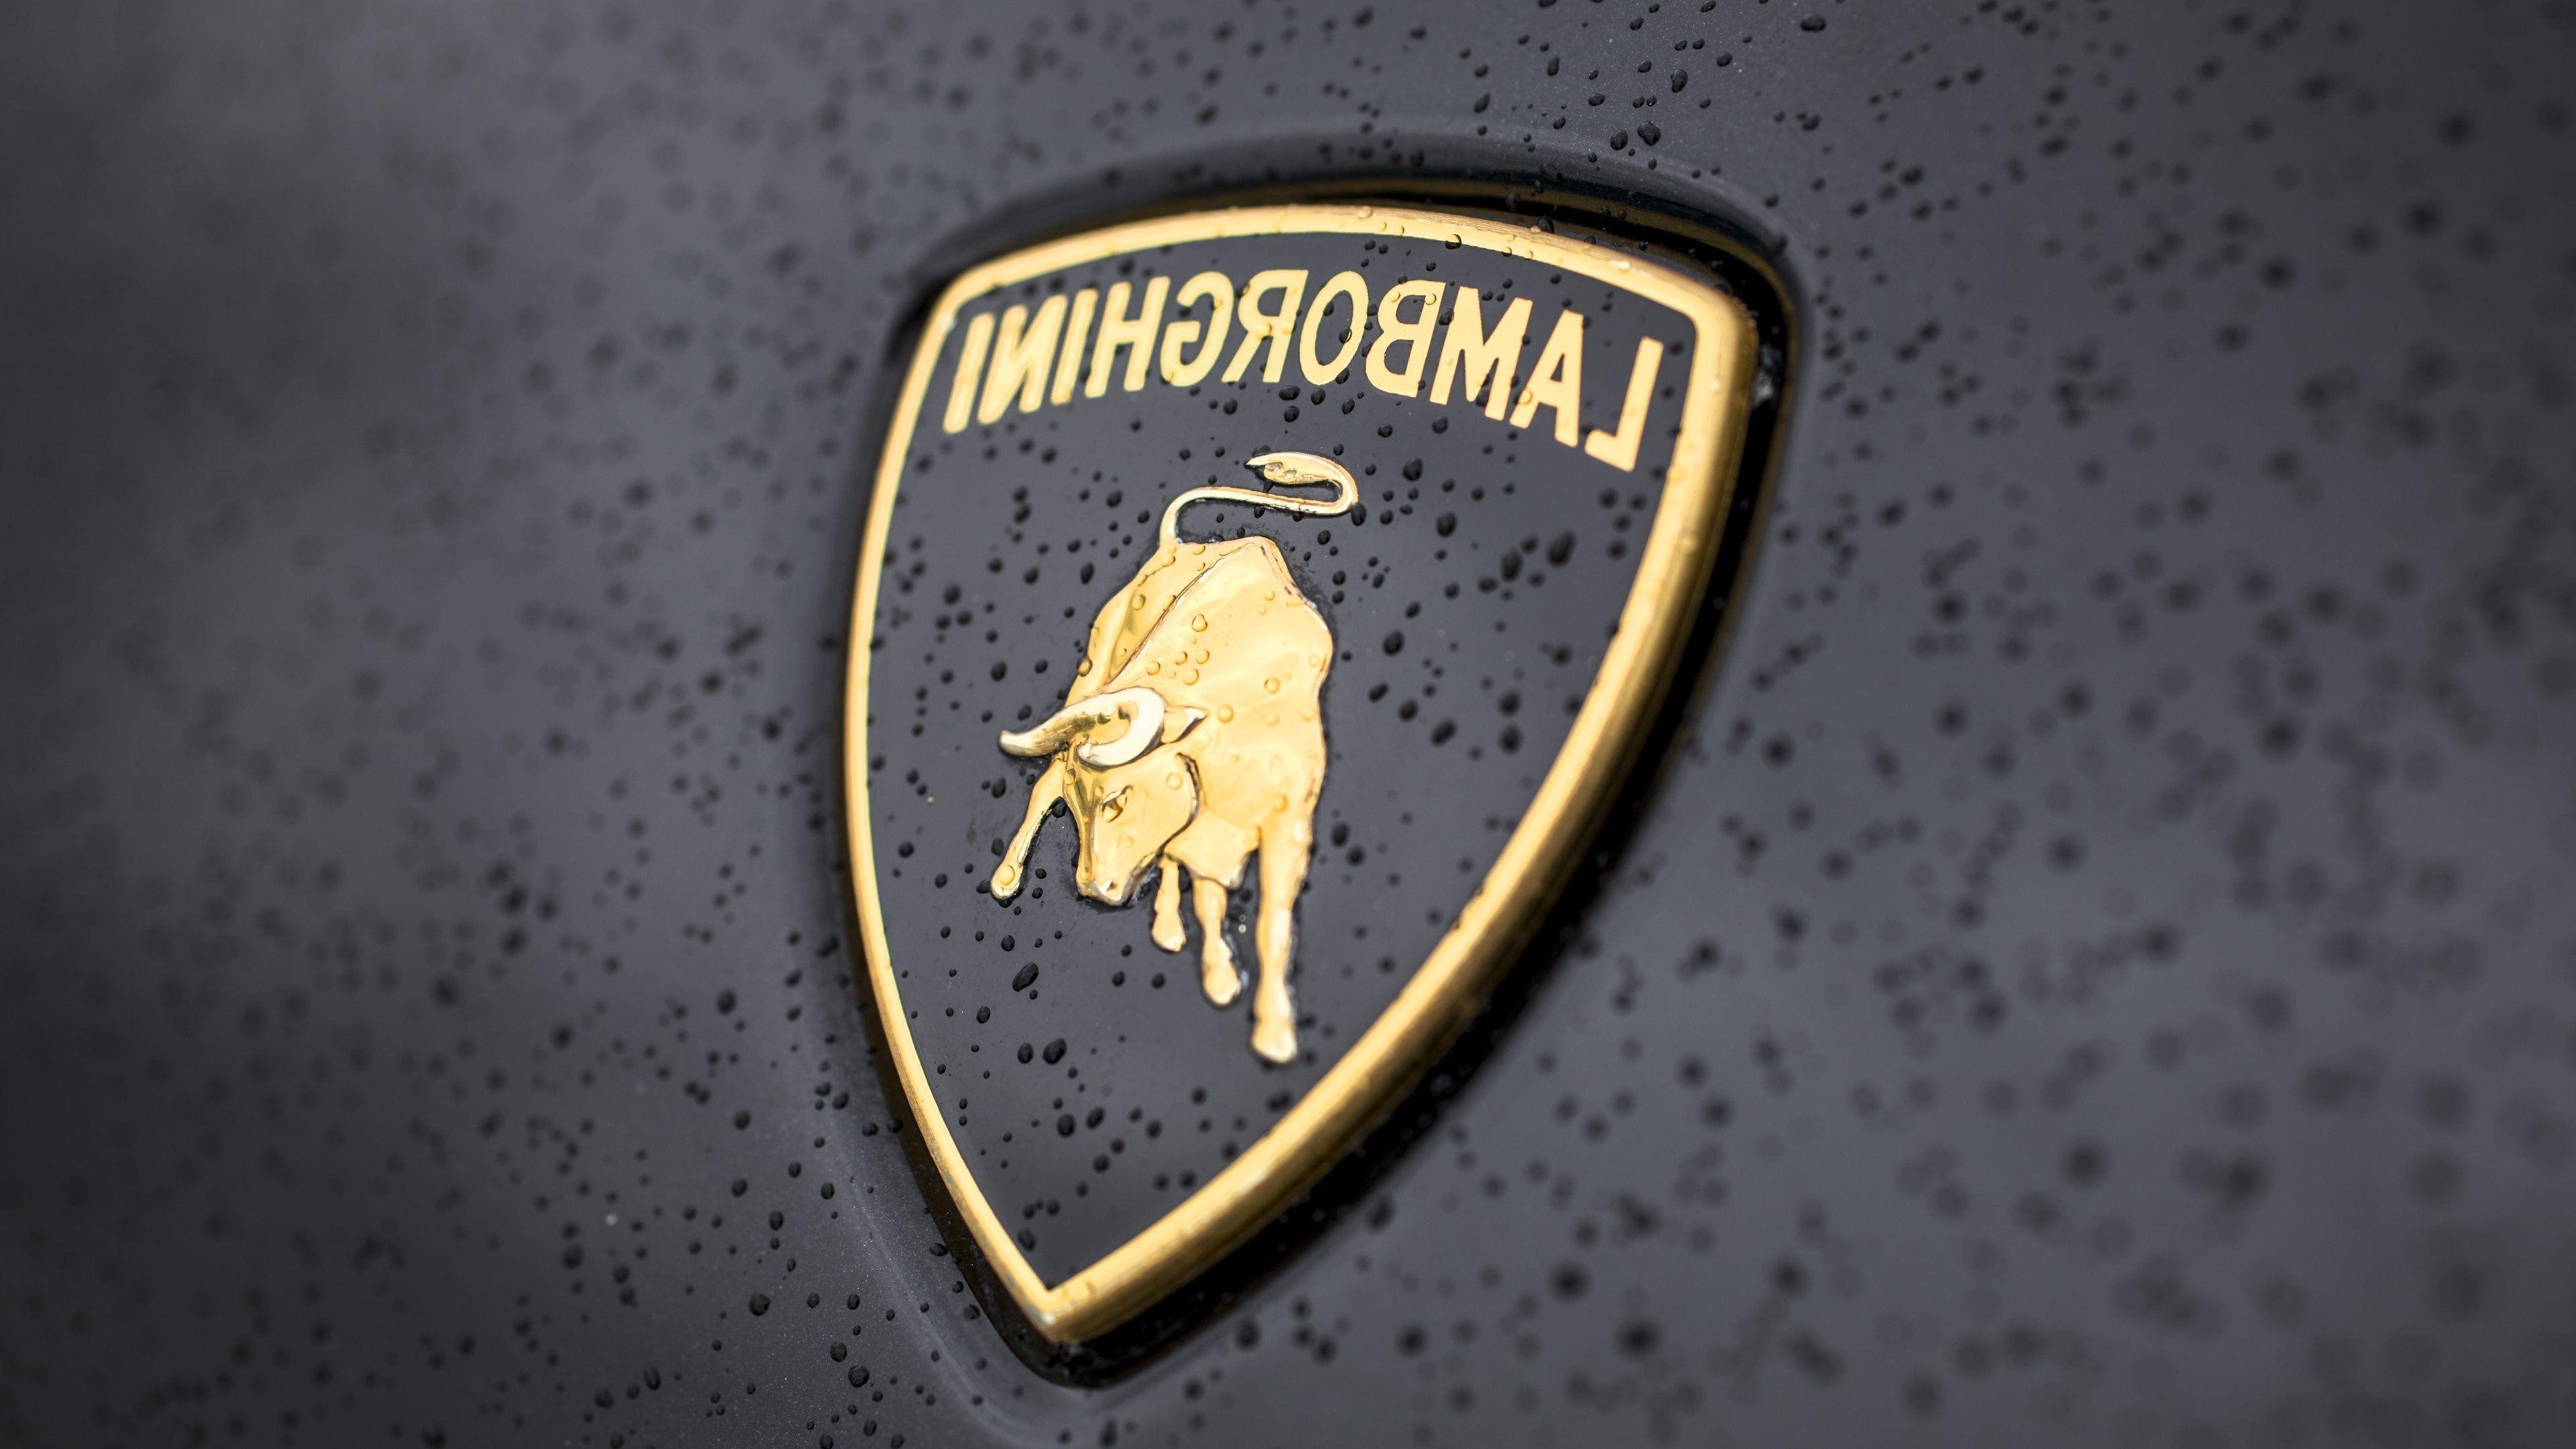 lamborghini logo wallpapers top free lamborghini logo